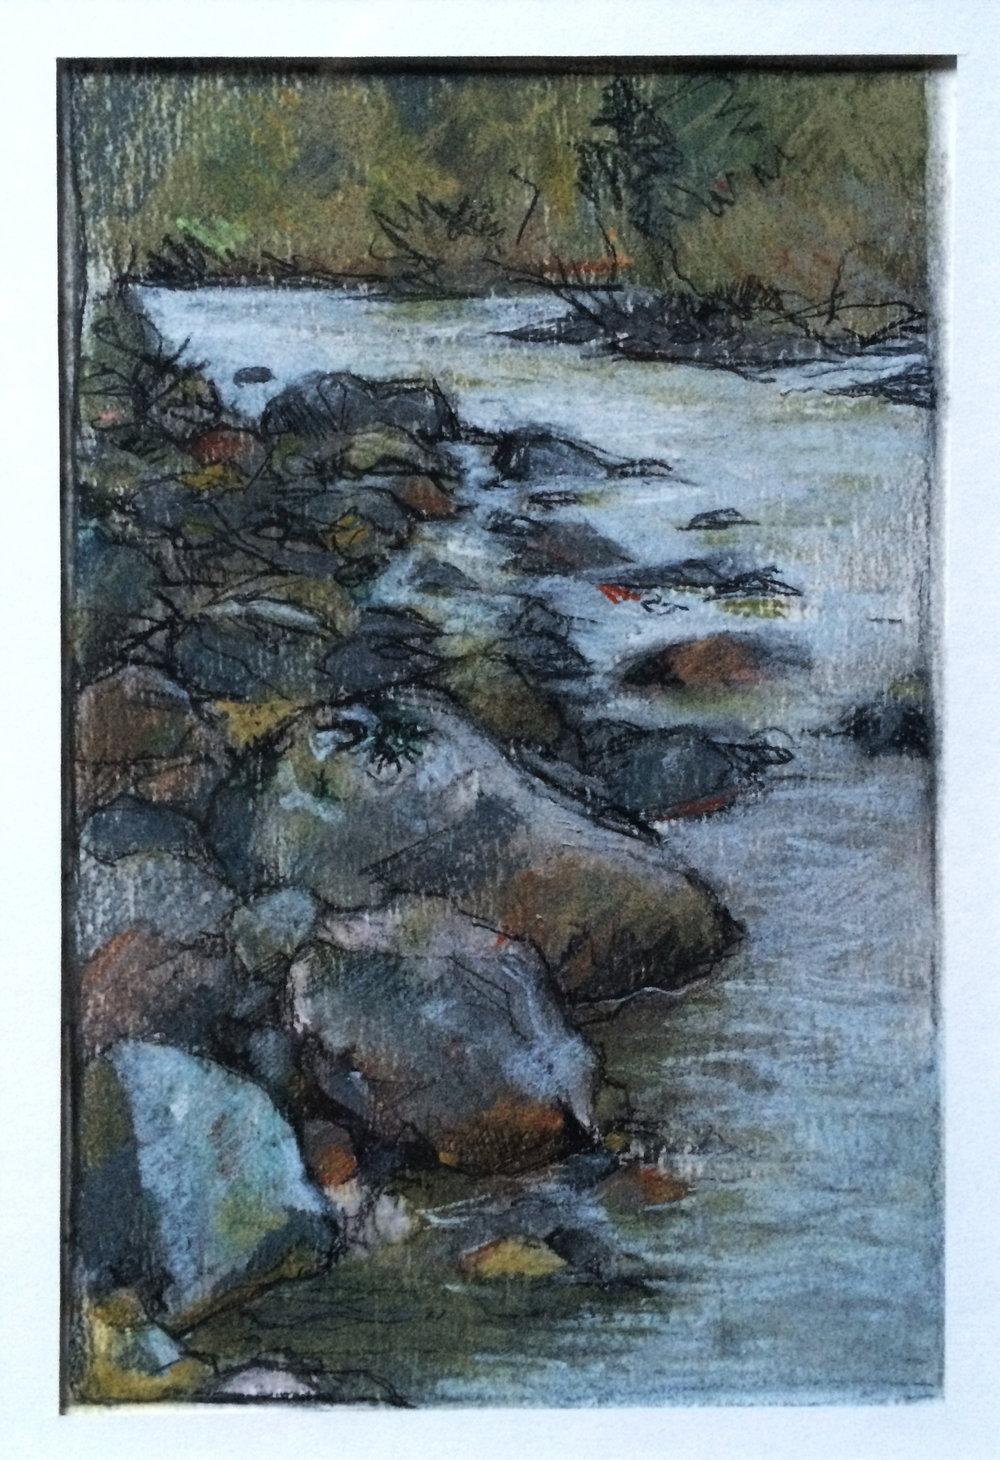 RiverMiddleFork.jpg